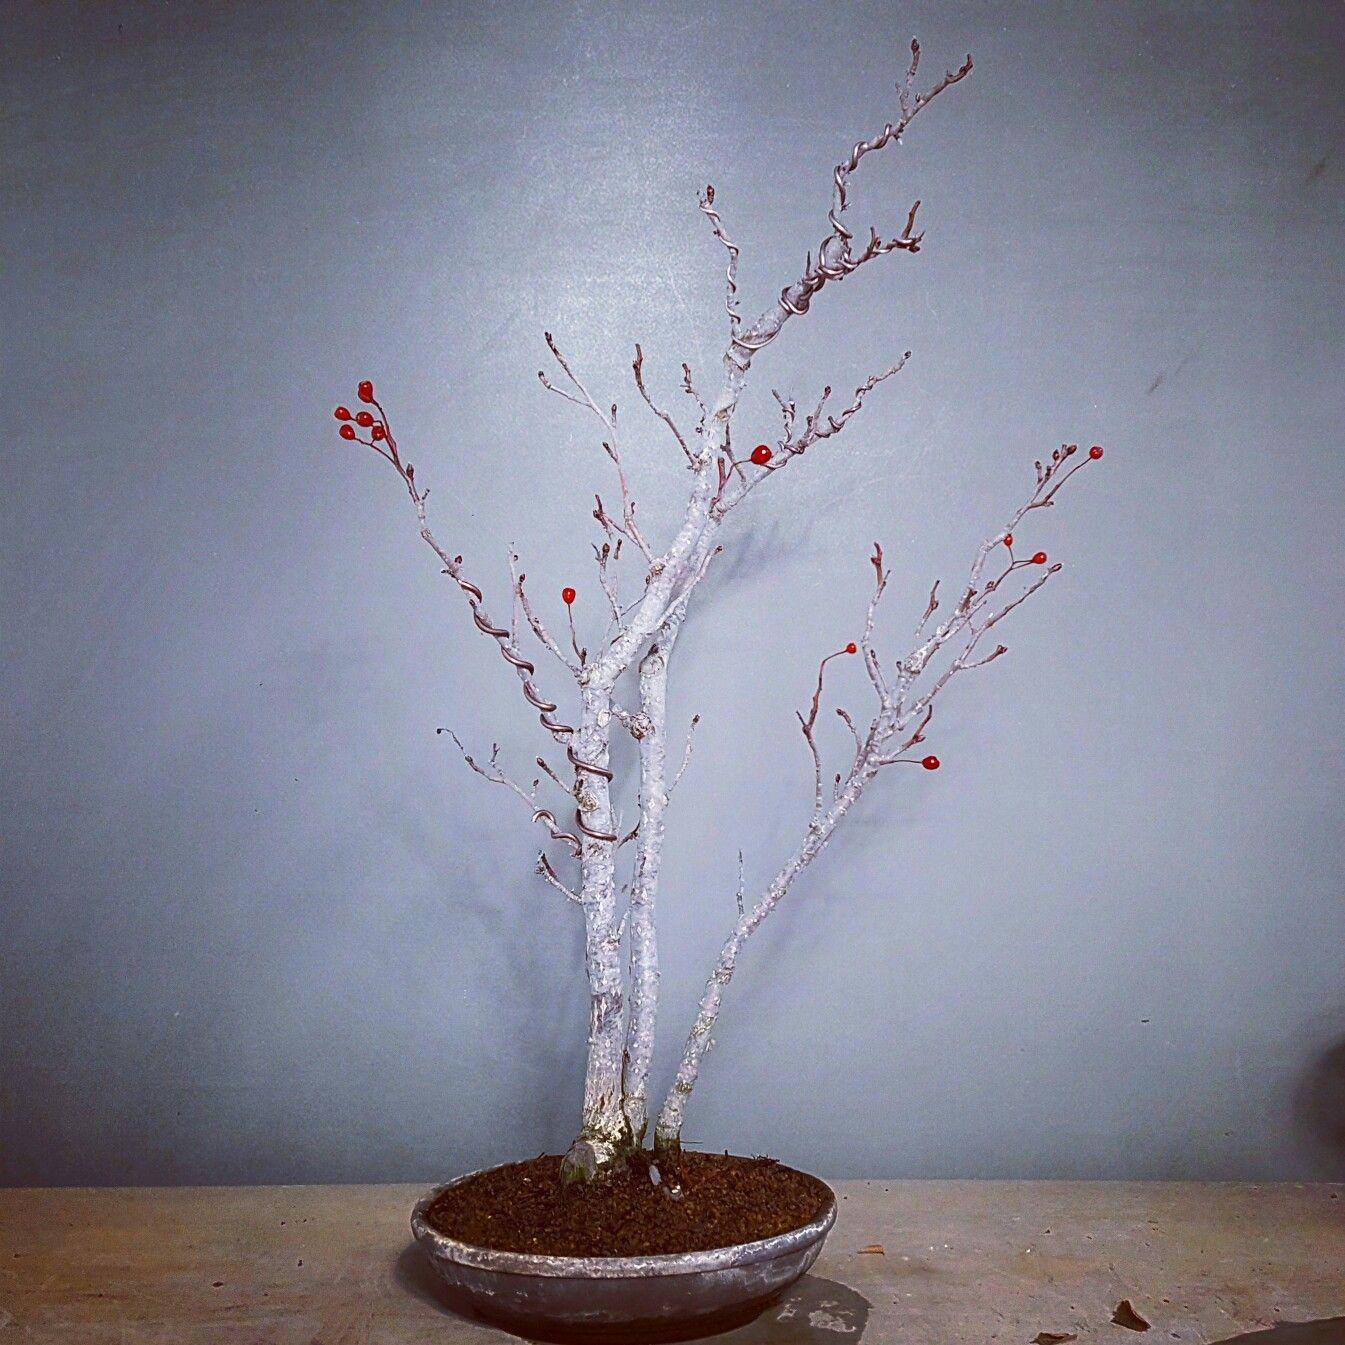 Bonsai, Bonsaitree, Sorbus Alnifolia, 팥배나무, Dec. 2016